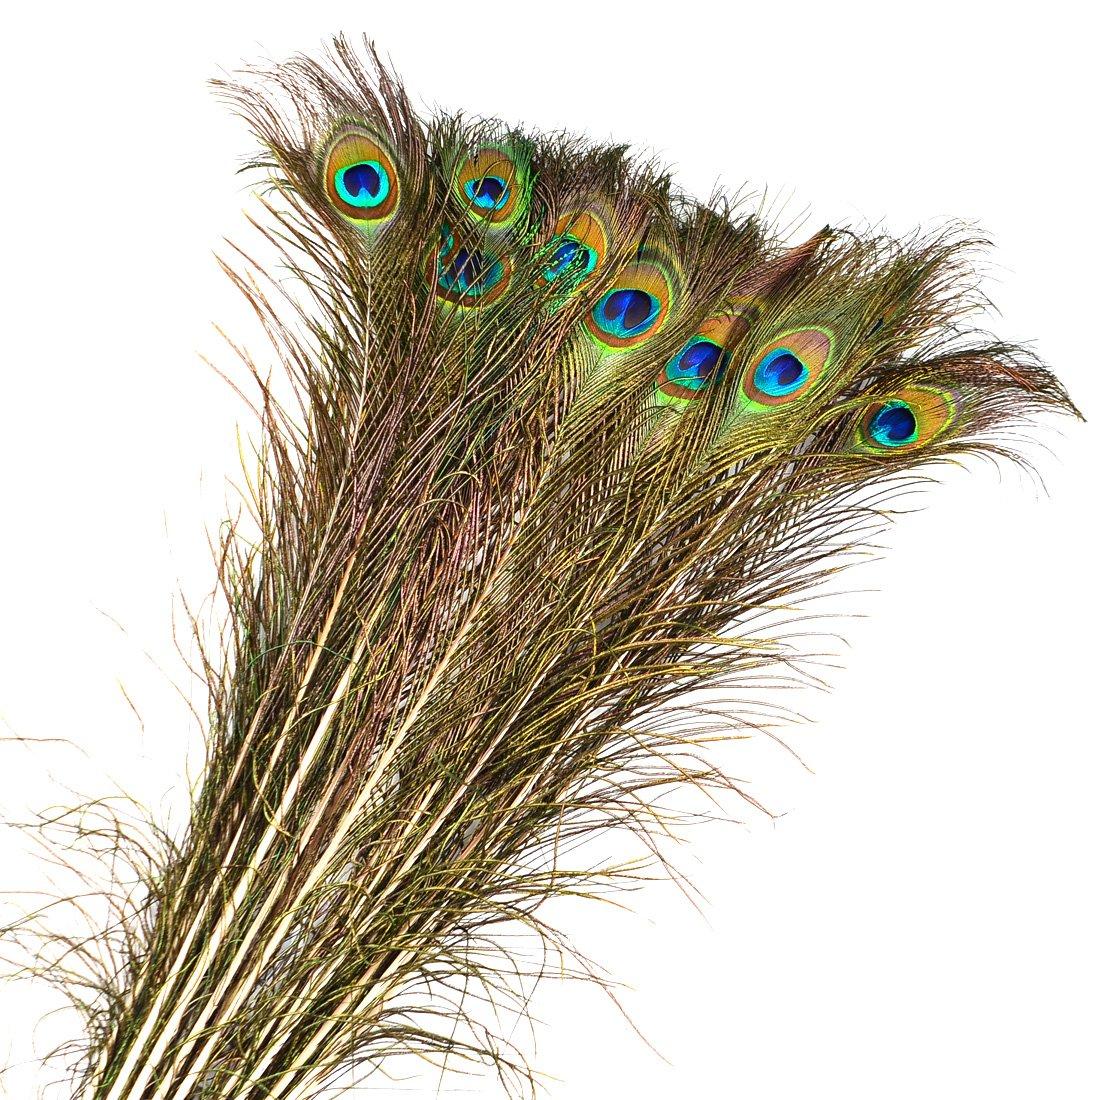 Genuino Piuma, FOKOM 20 Pack 90CM Piume di Pavone Natural Peacock Feather